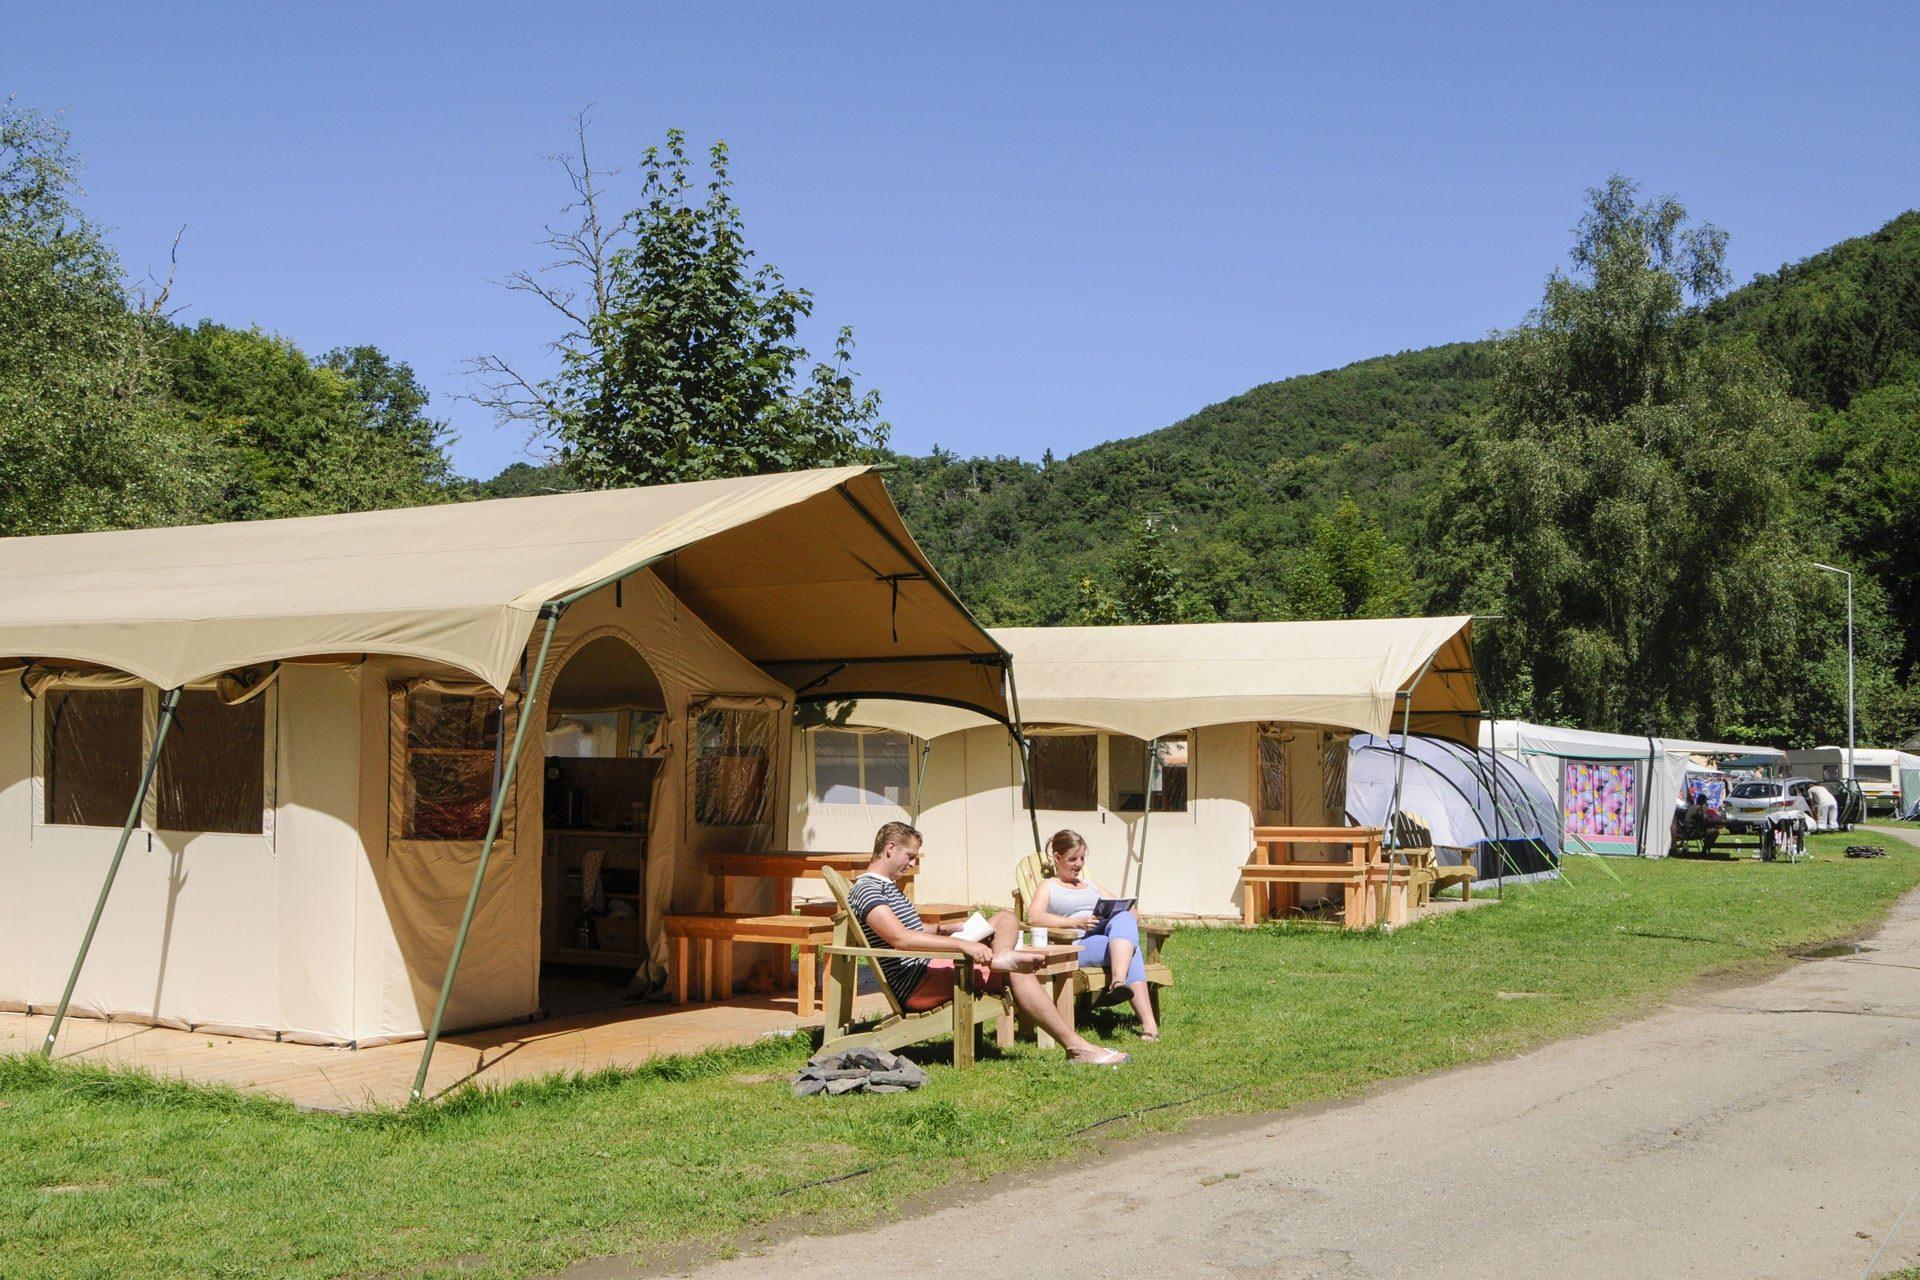 Fotogalerie - Camping Kautenbach